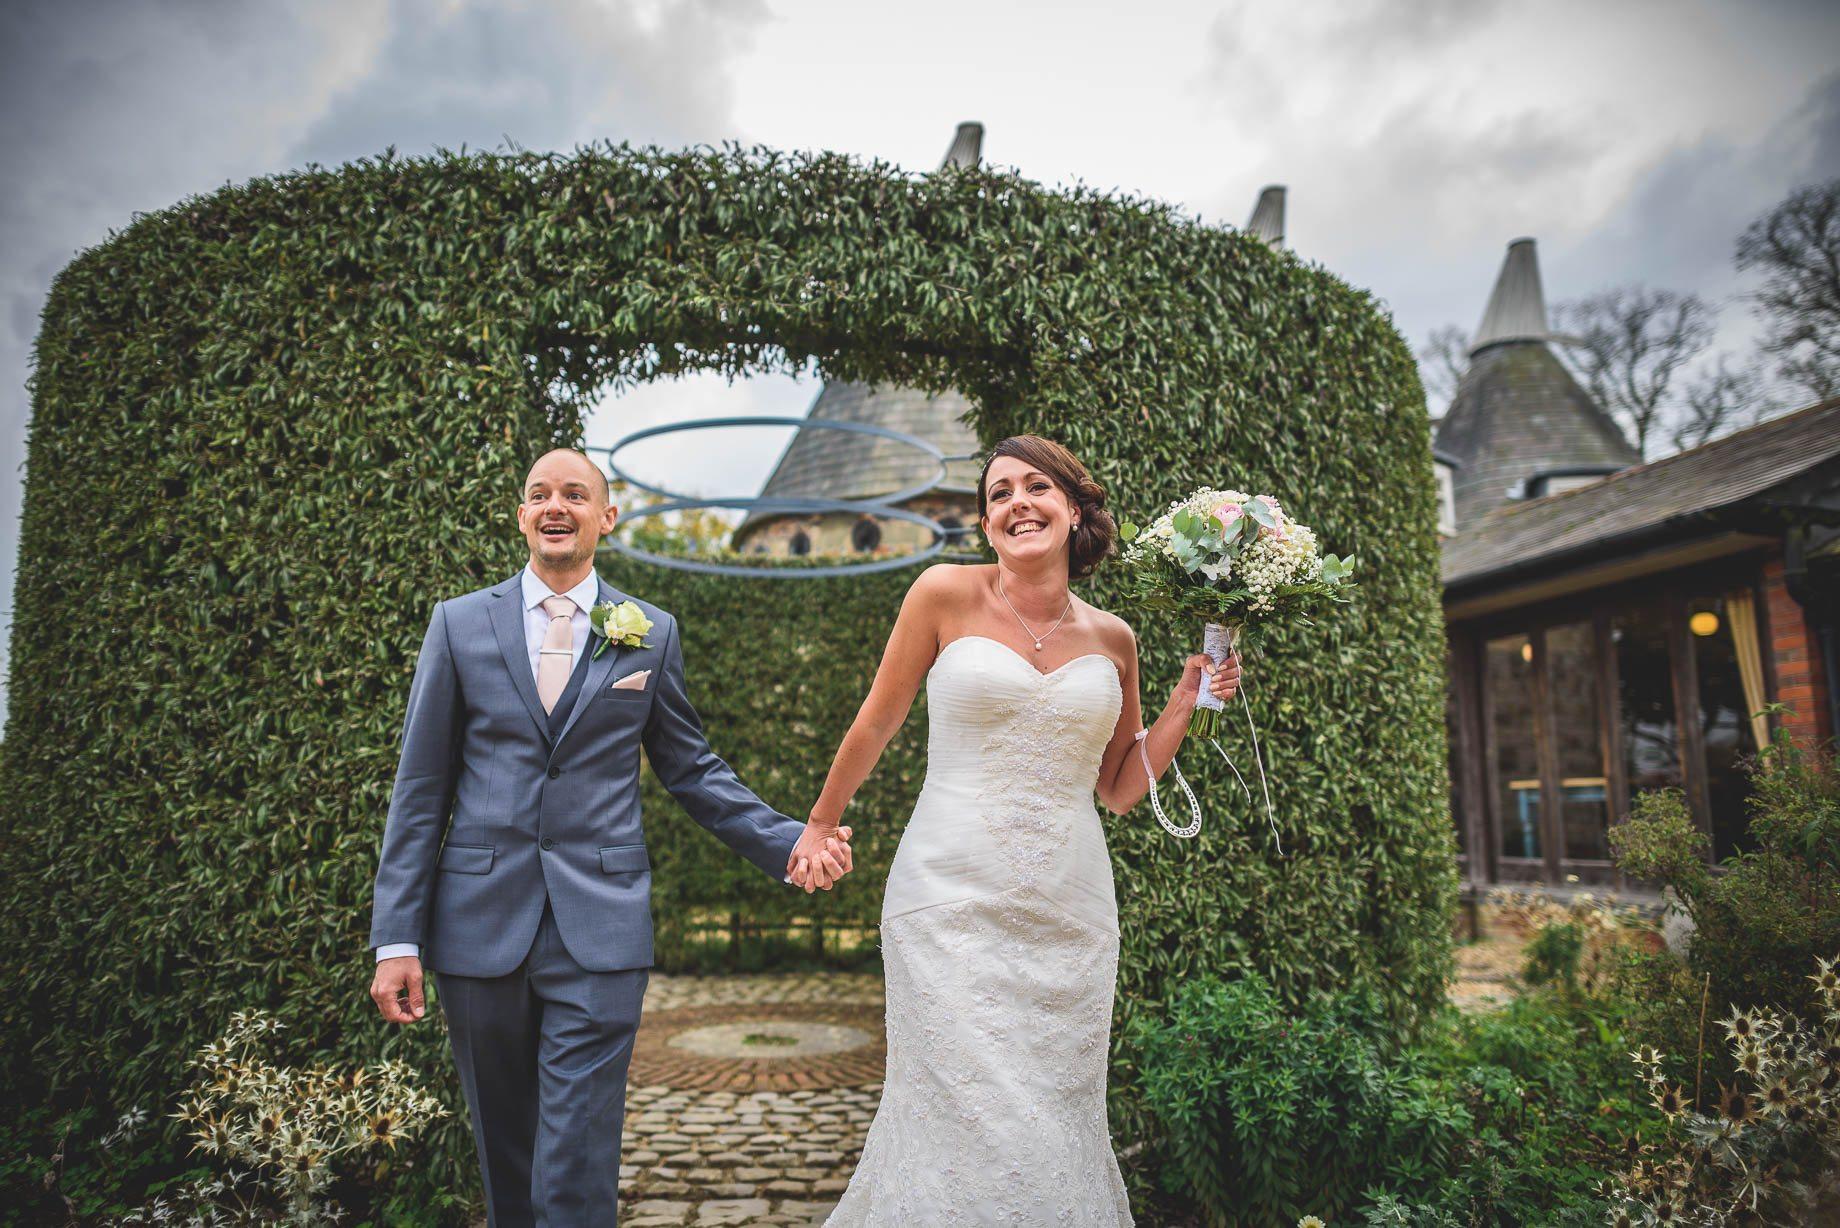 Bury-Court-Barn-wedding-photography-Guy-Collier-Photography-Karen-and-John-69-of-166